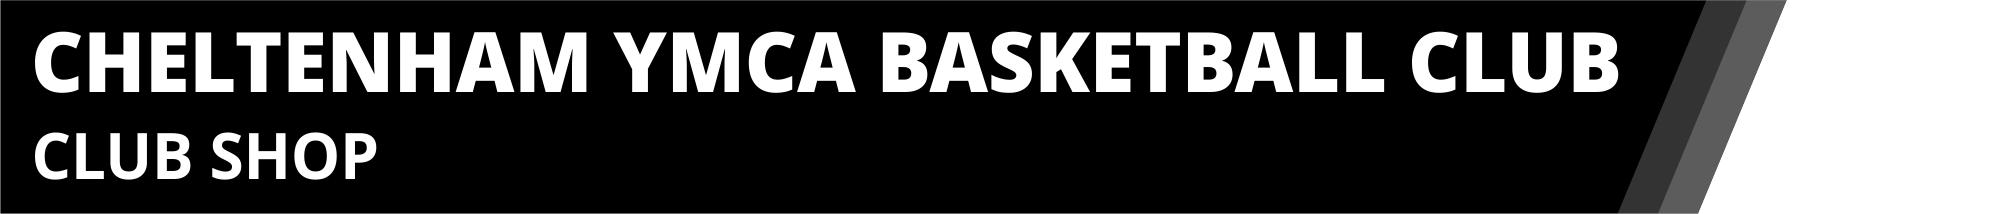 cheltenham-ymca-basketball-club-club-shop-banner.png